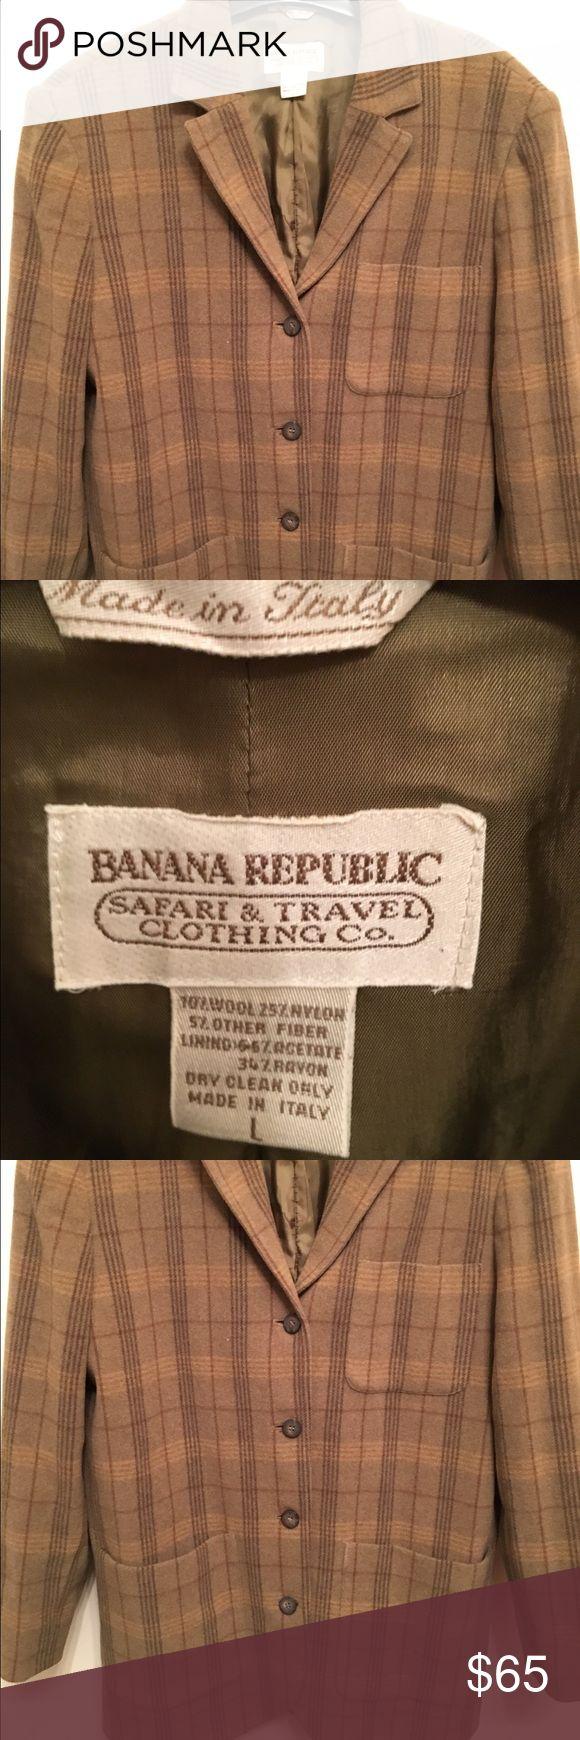 Vintage Bananna Republic Safari& Travel coat Very sharp looking coat Banana Republic Suits & Blazers Sport Coats & Blazers